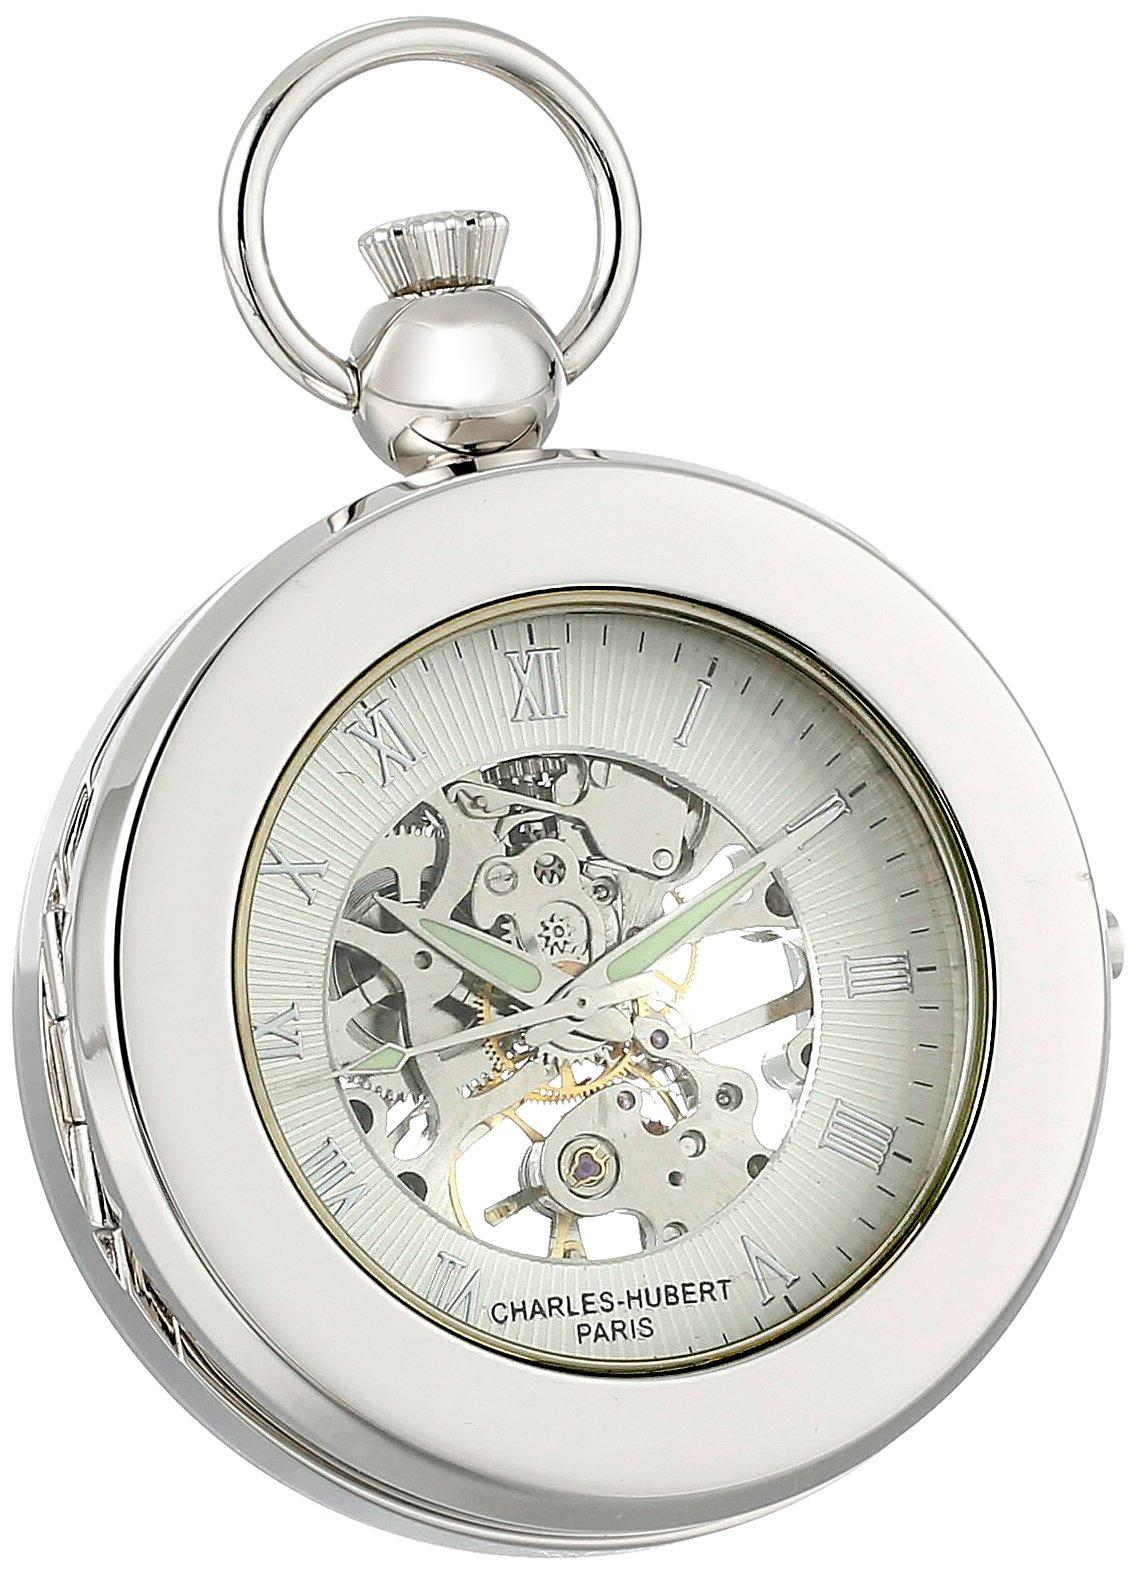 Charles Hubert 3849 Mechanical Picture Frame Pocket Watch by CHARLES-HUBERT PARIS (Image #2)